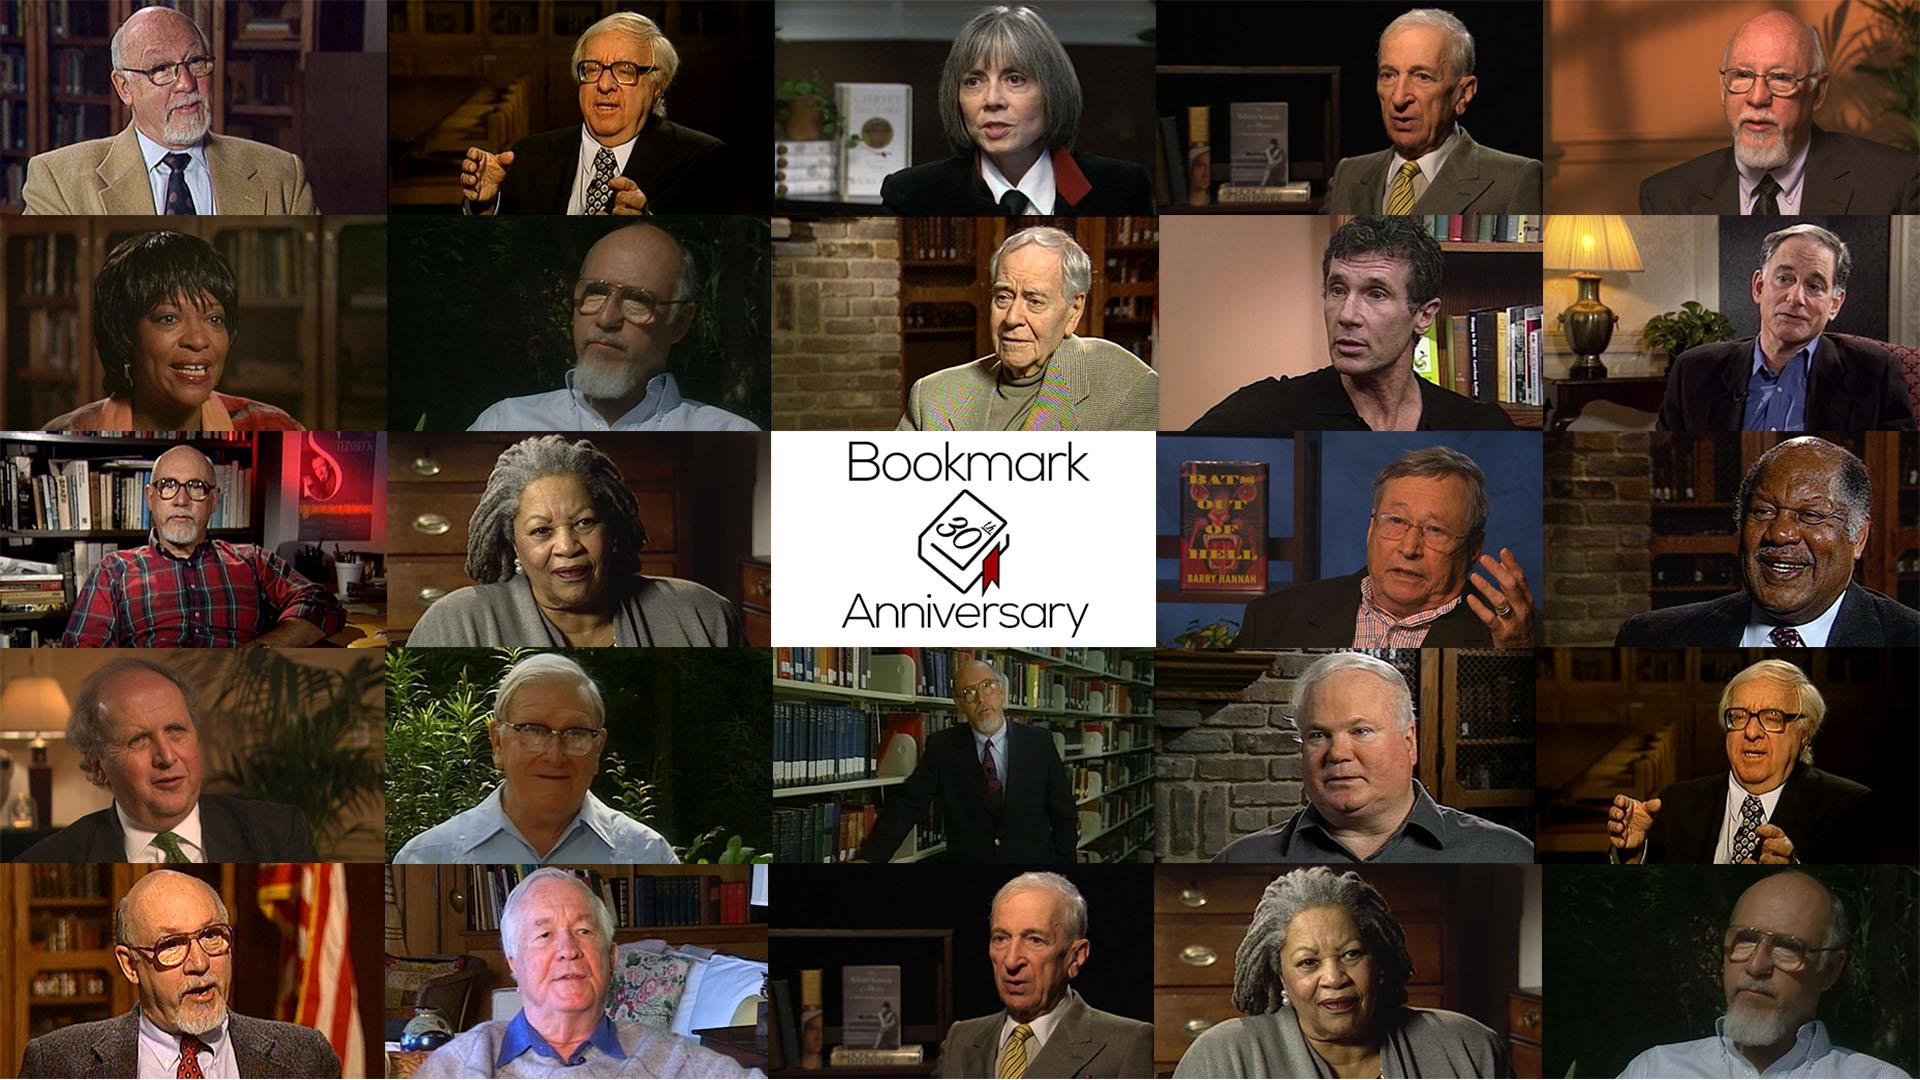 Bookmark 30th Anniversary on APT